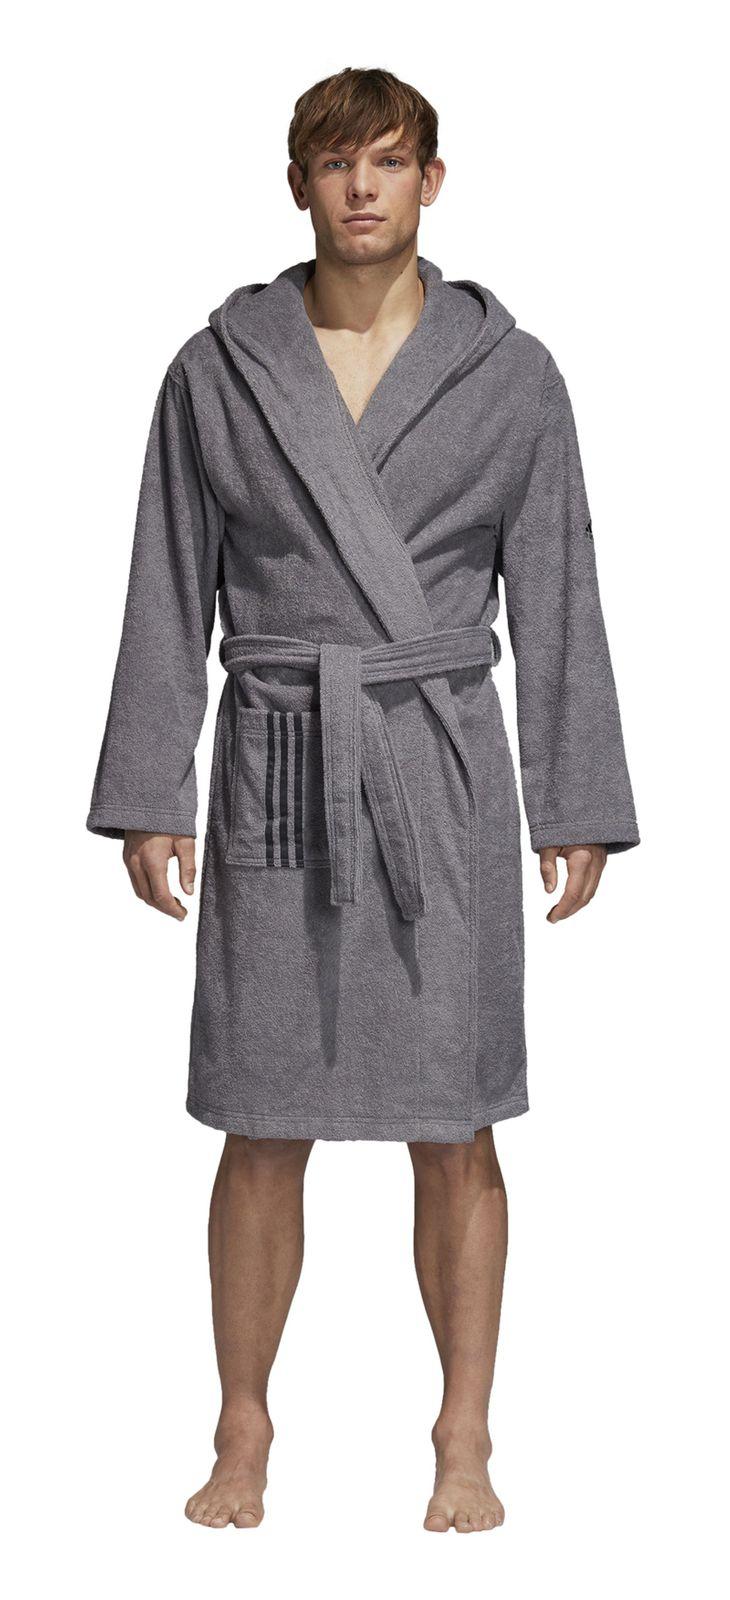 adidas performance herren bademantel bathrobe unisex grau carbon ebay. Black Bedroom Furniture Sets. Home Design Ideas